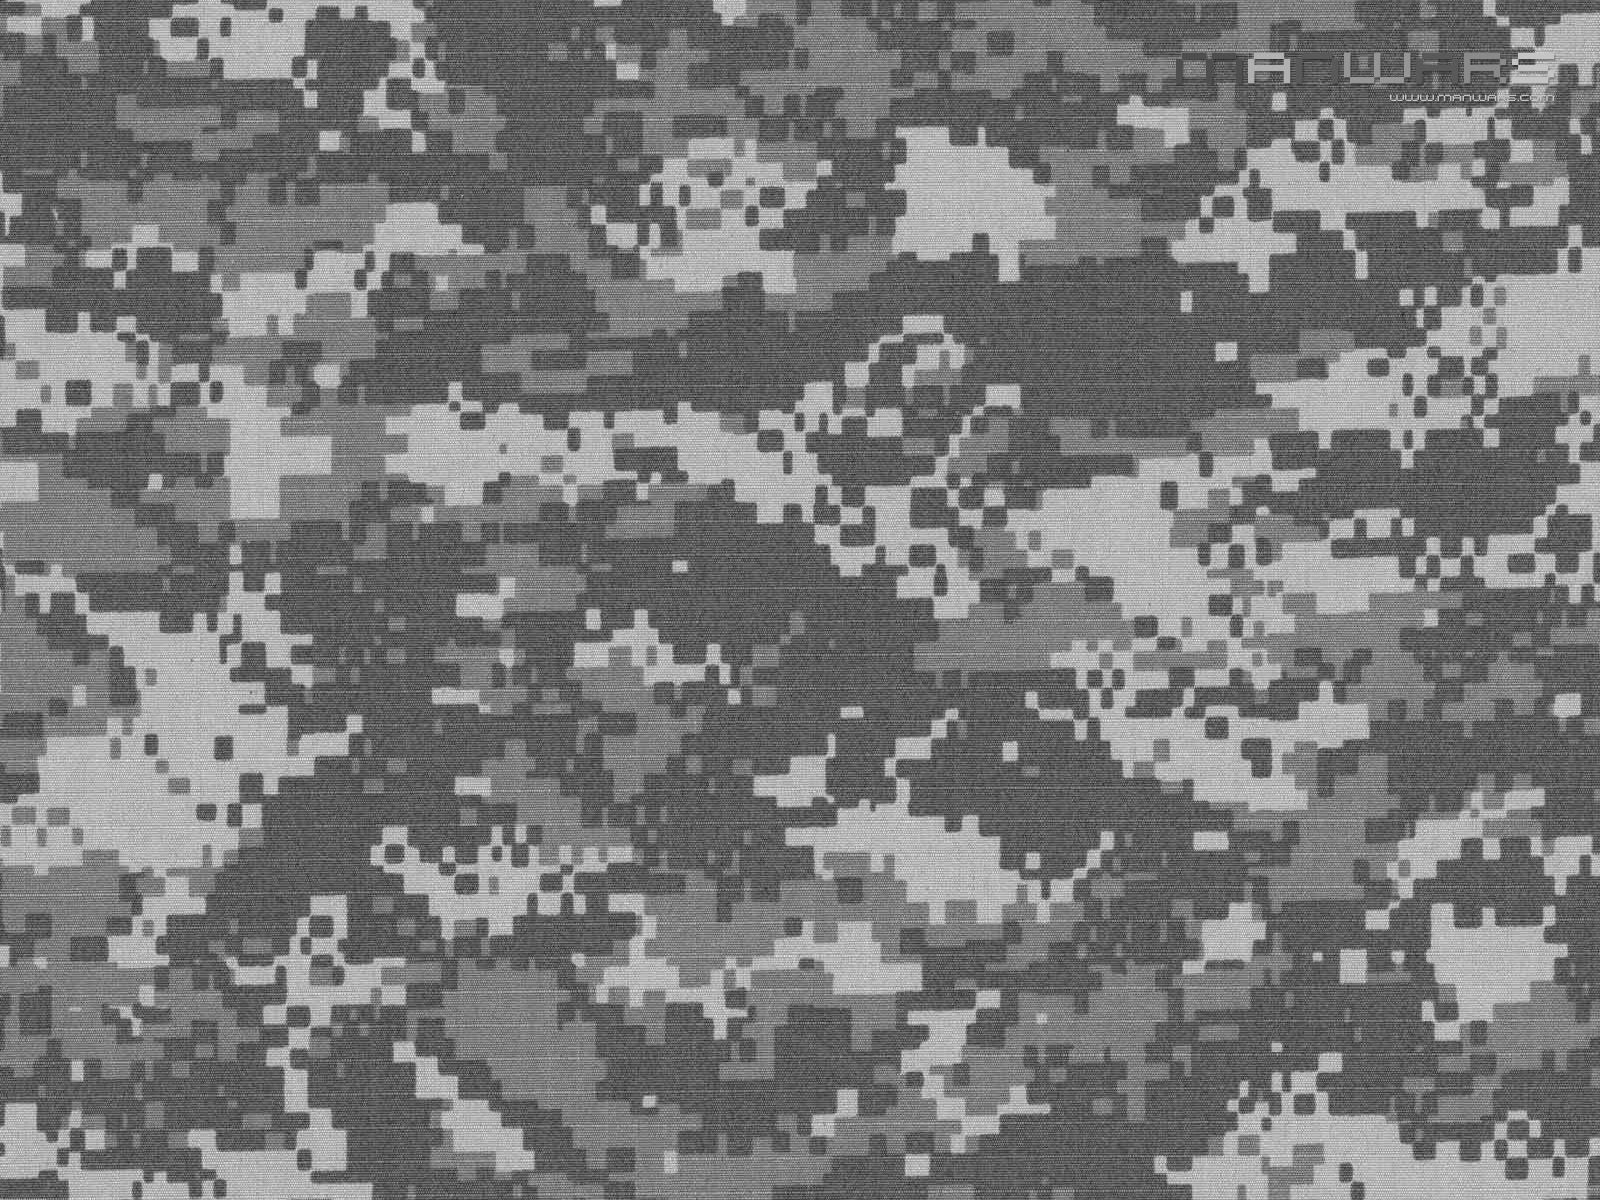 Digital Camo Wallpapers Top Free Digital Camo Backgrounds